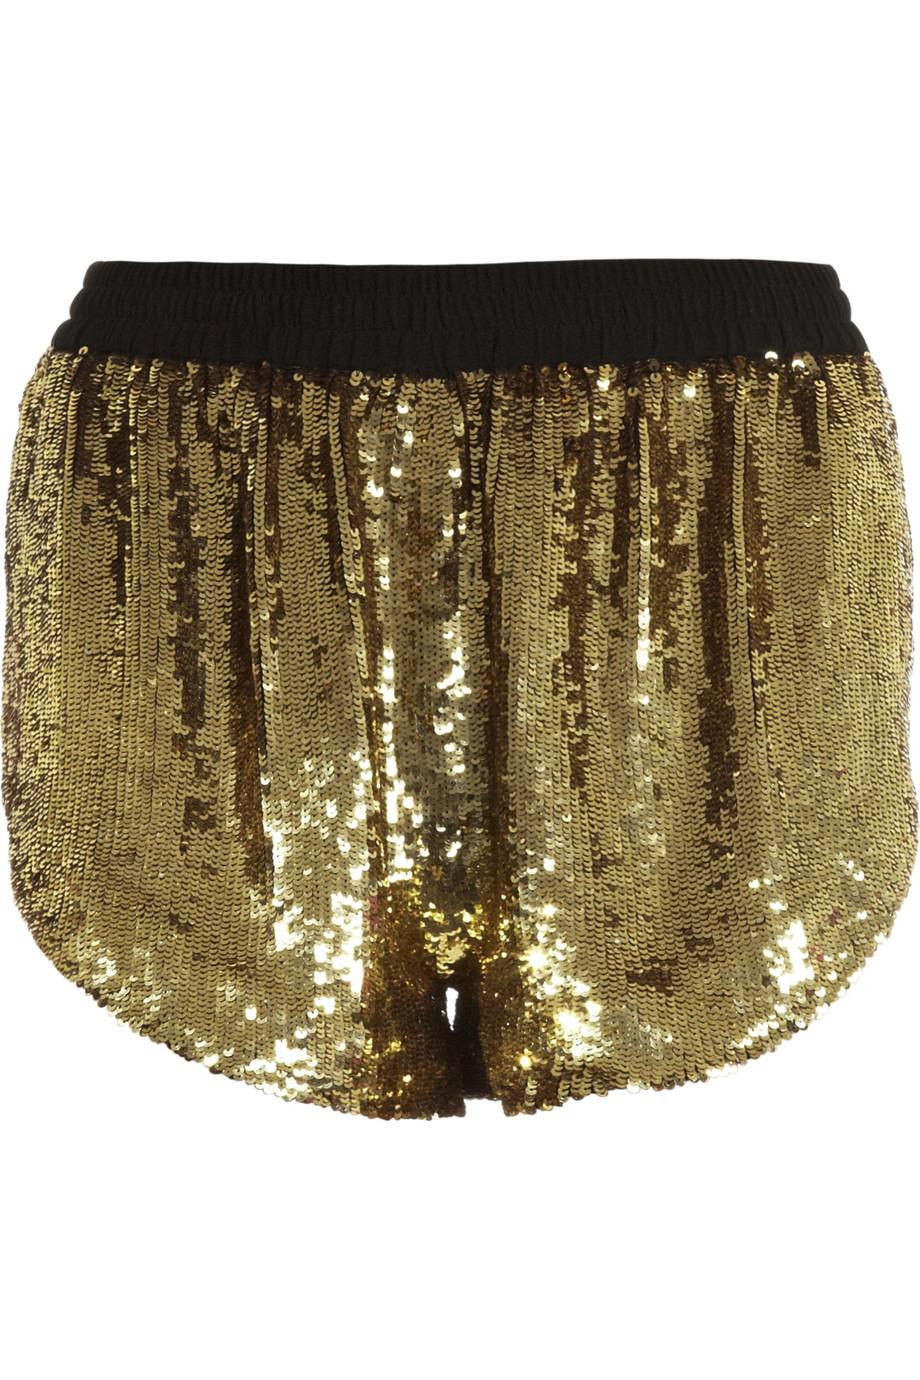 Discount ashish sequin disco shorts